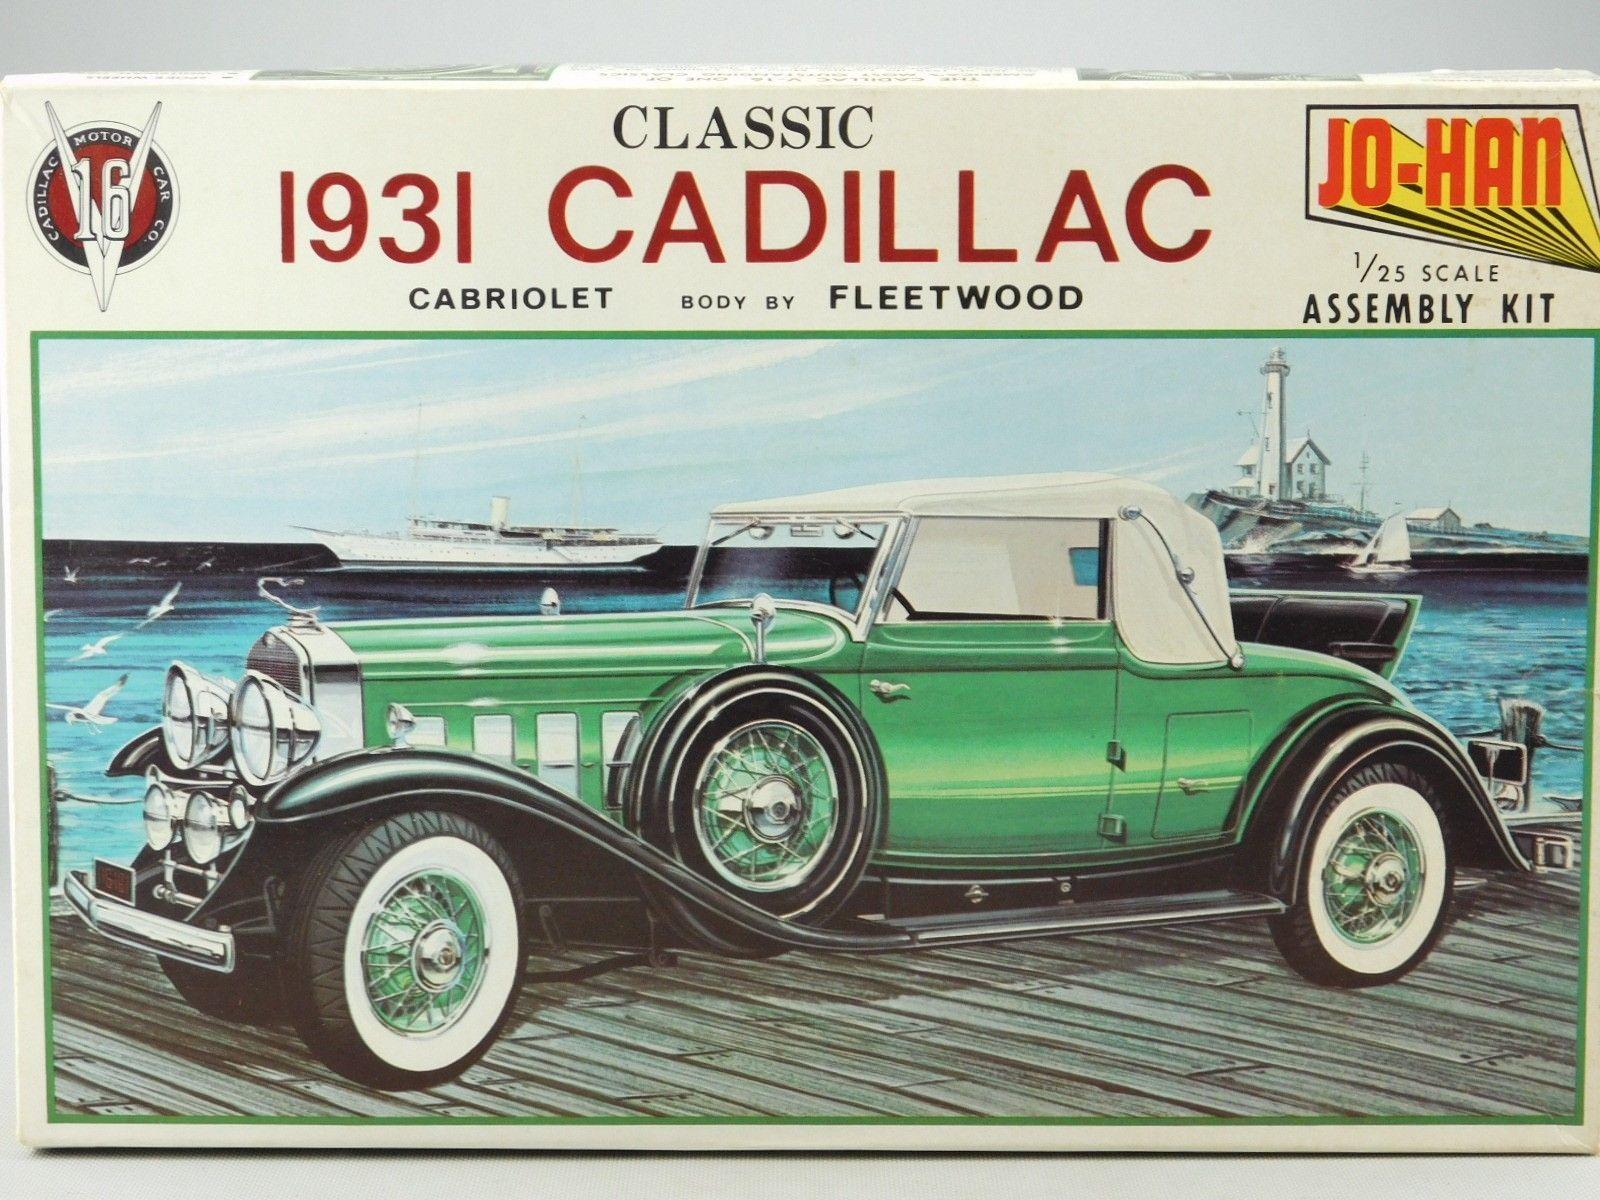 1 25 Scale Model Kit Vintage Jo Han GC 431 1931 Cadillac Cabriolet ...